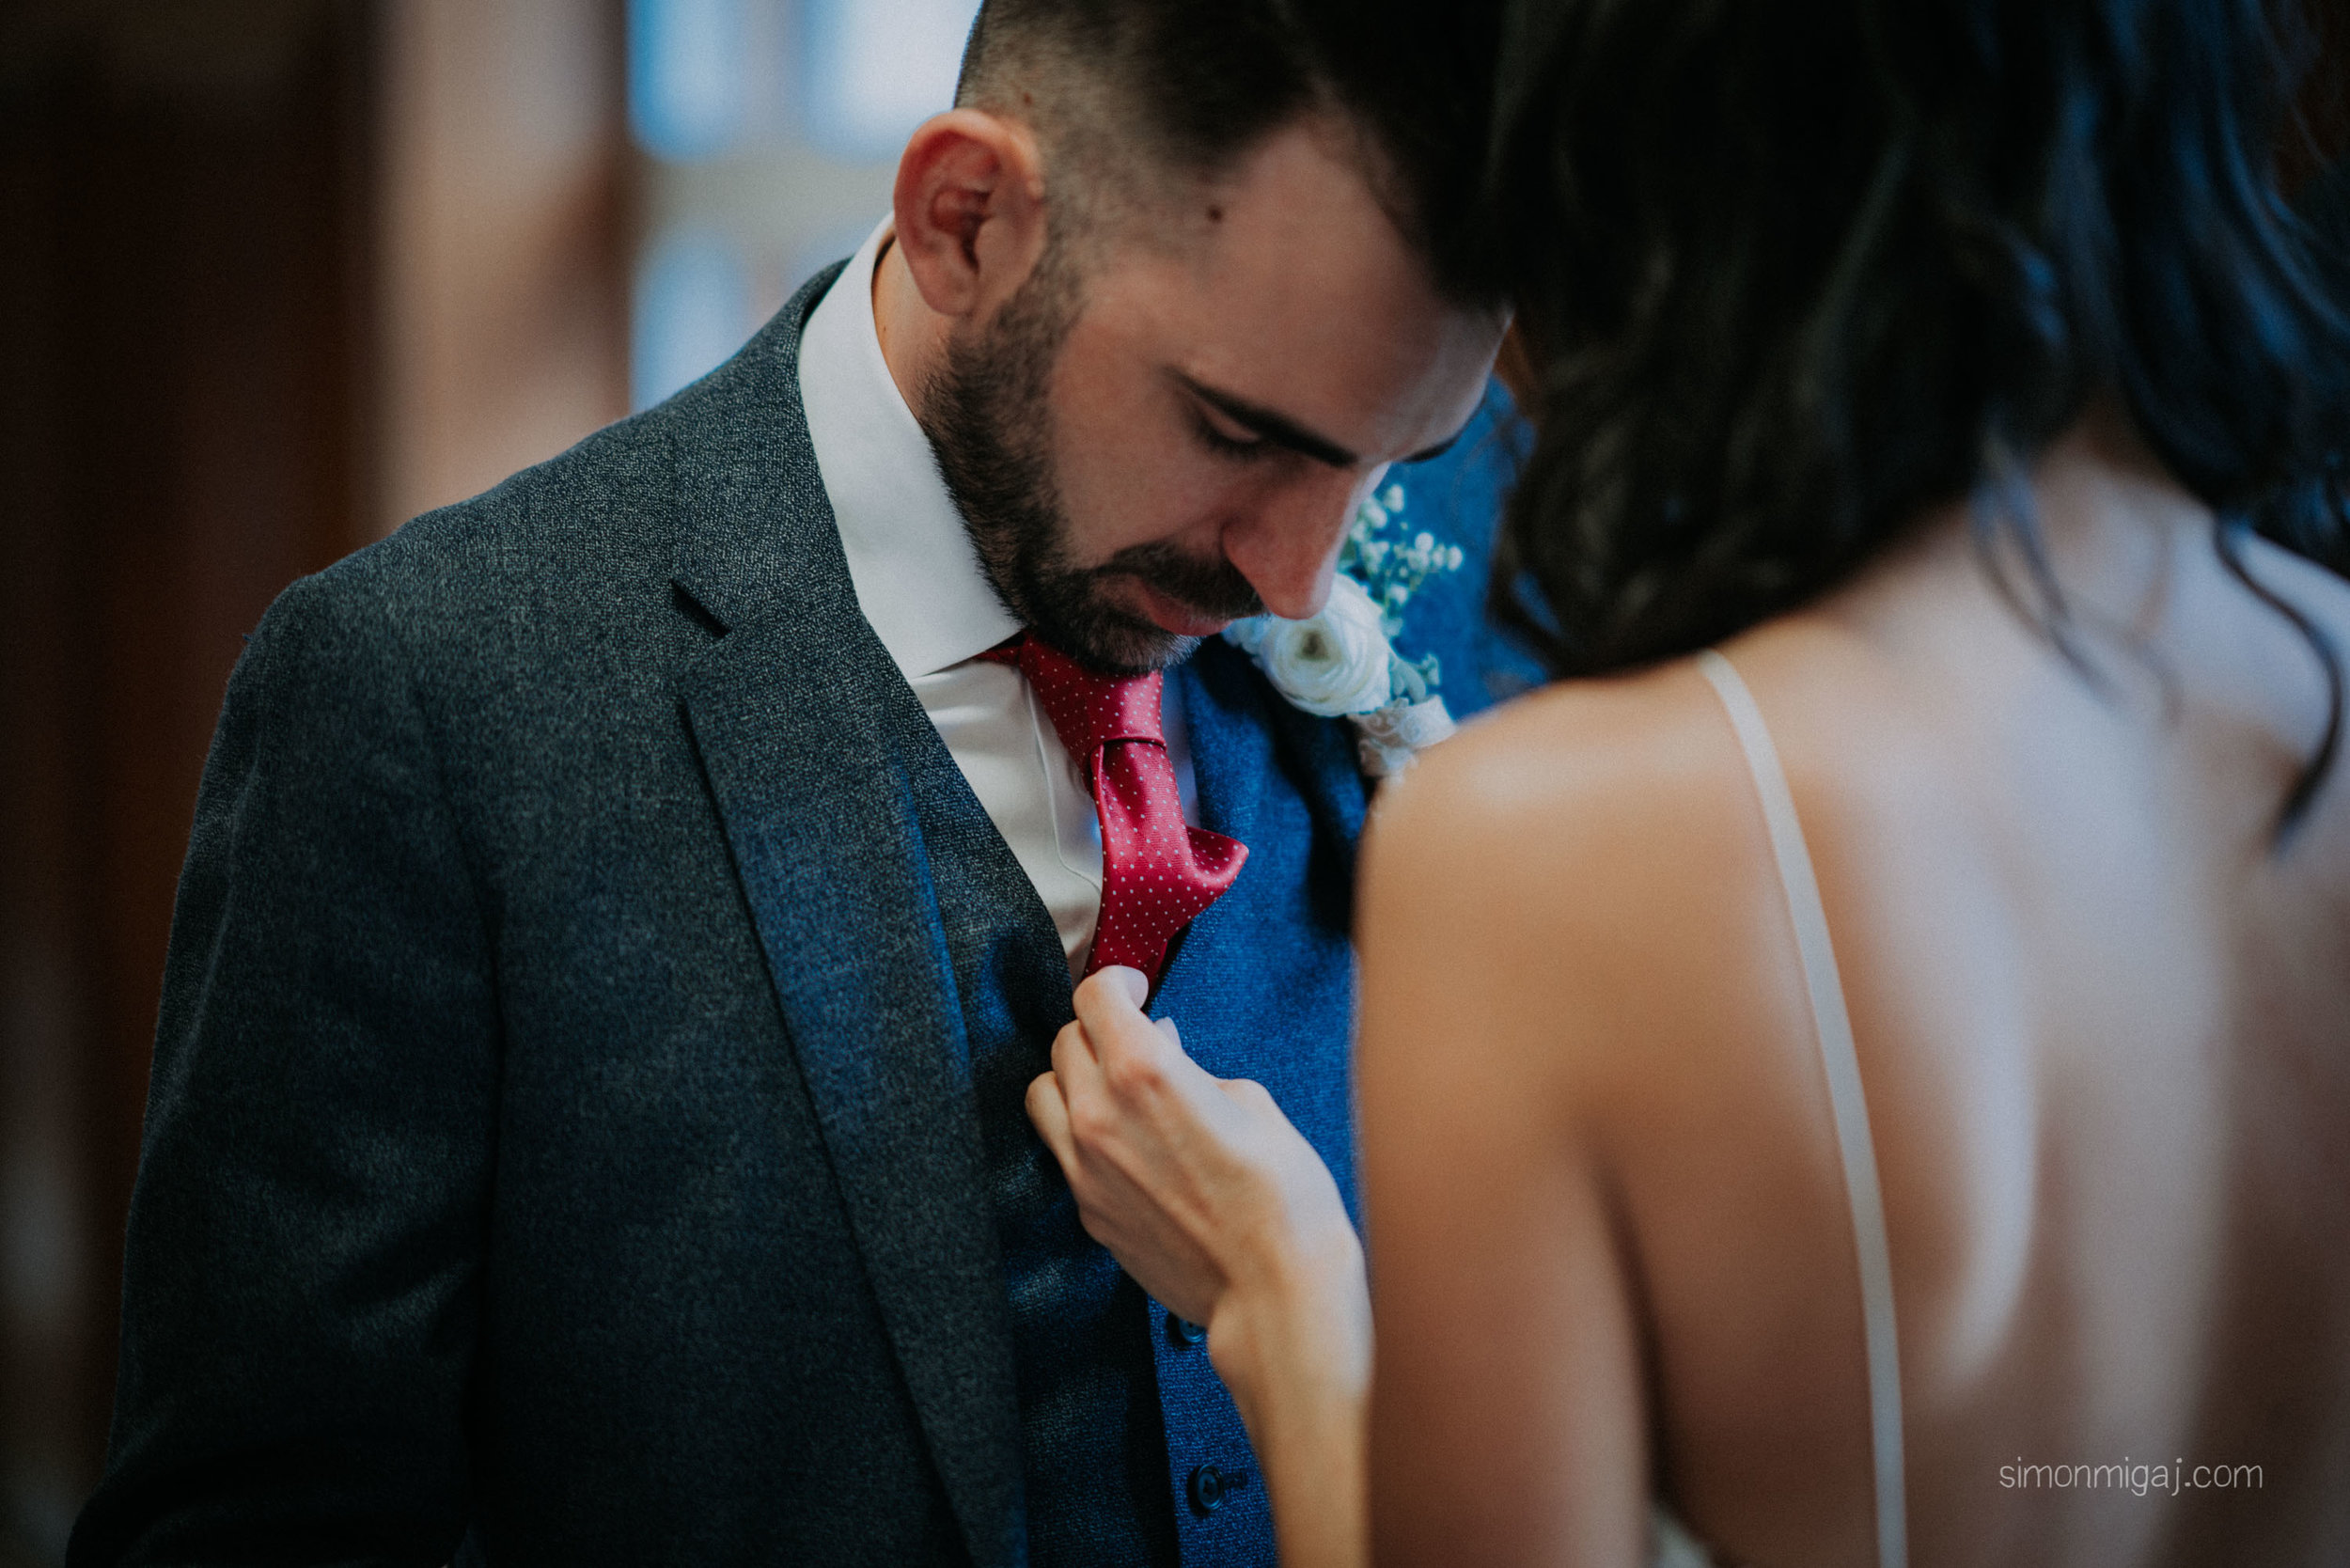 170504_WeddingPhotography_MayaAndrew-6.jpg